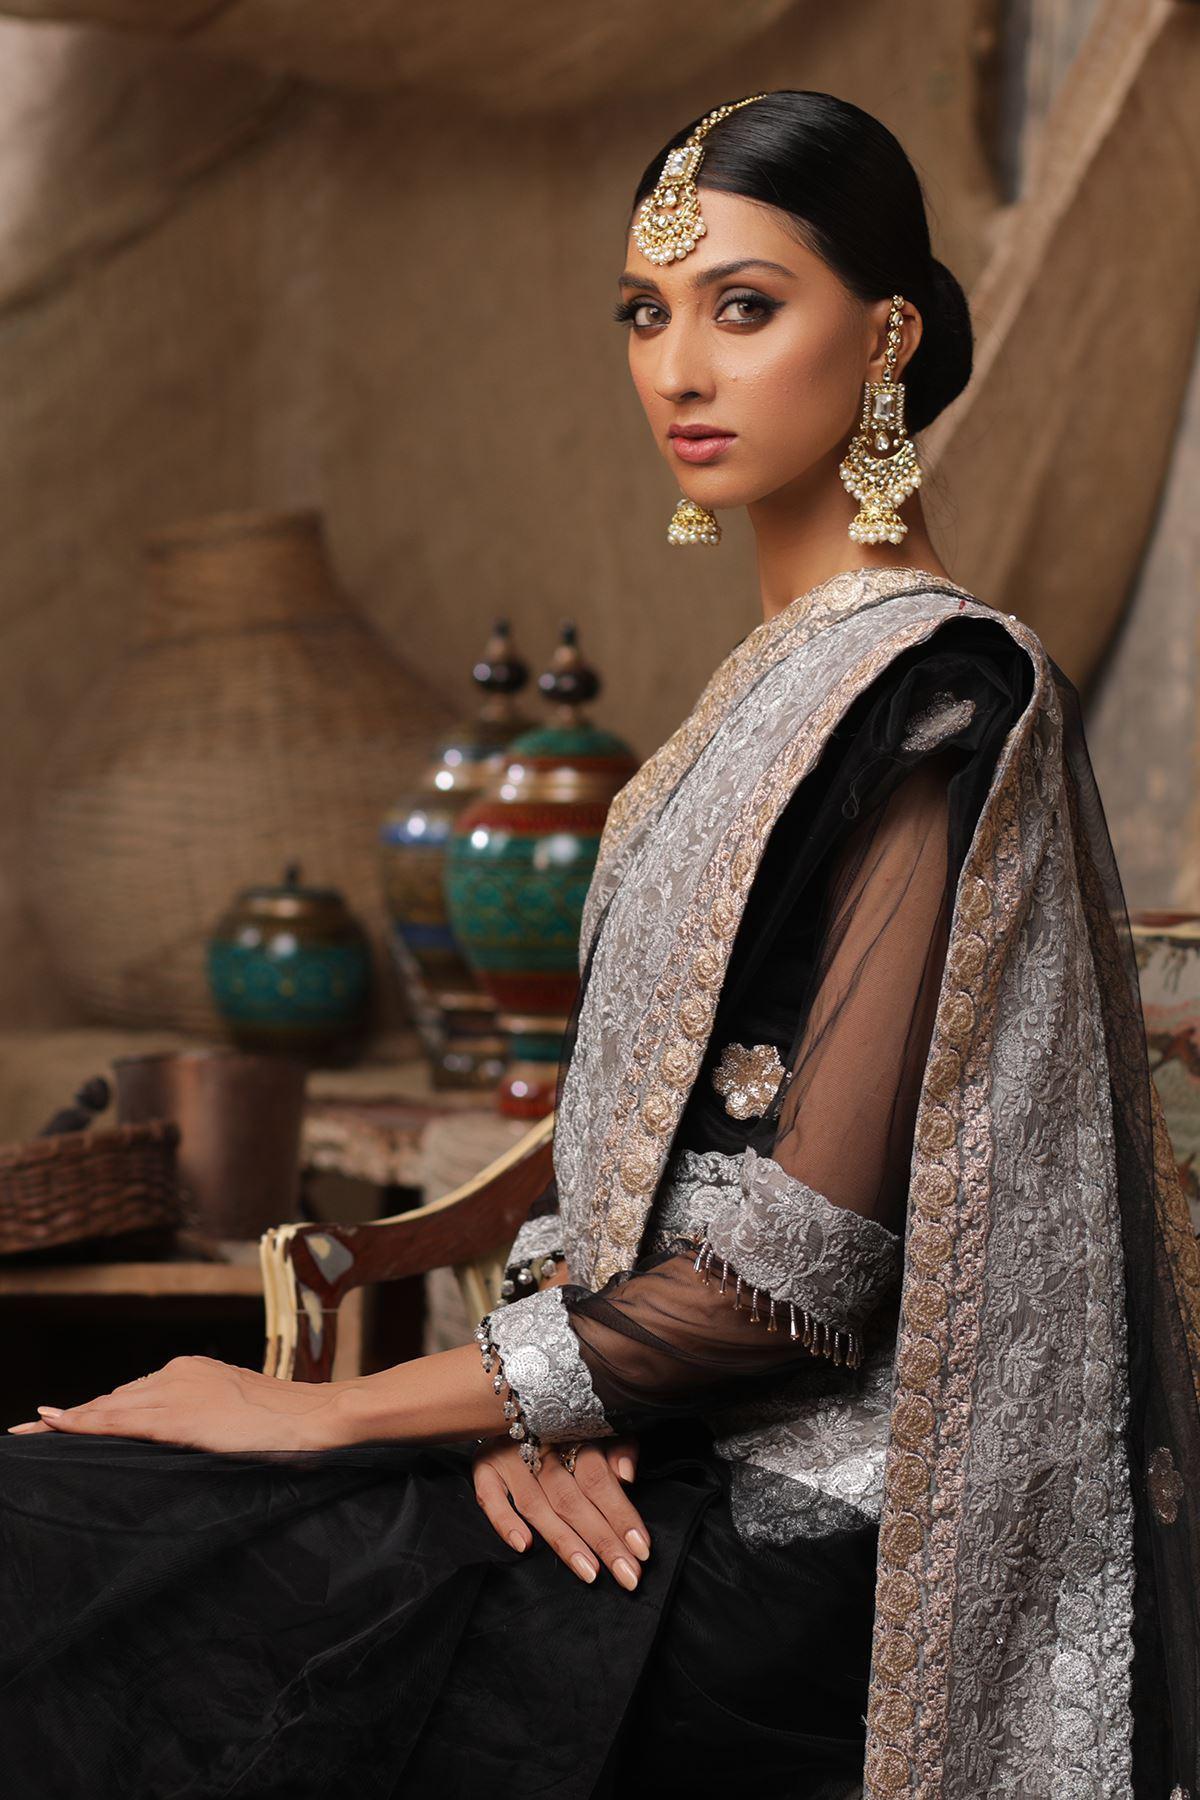 Moazzam Khan Formal 3PC Saree Blouse Petti Coat in Black for Women